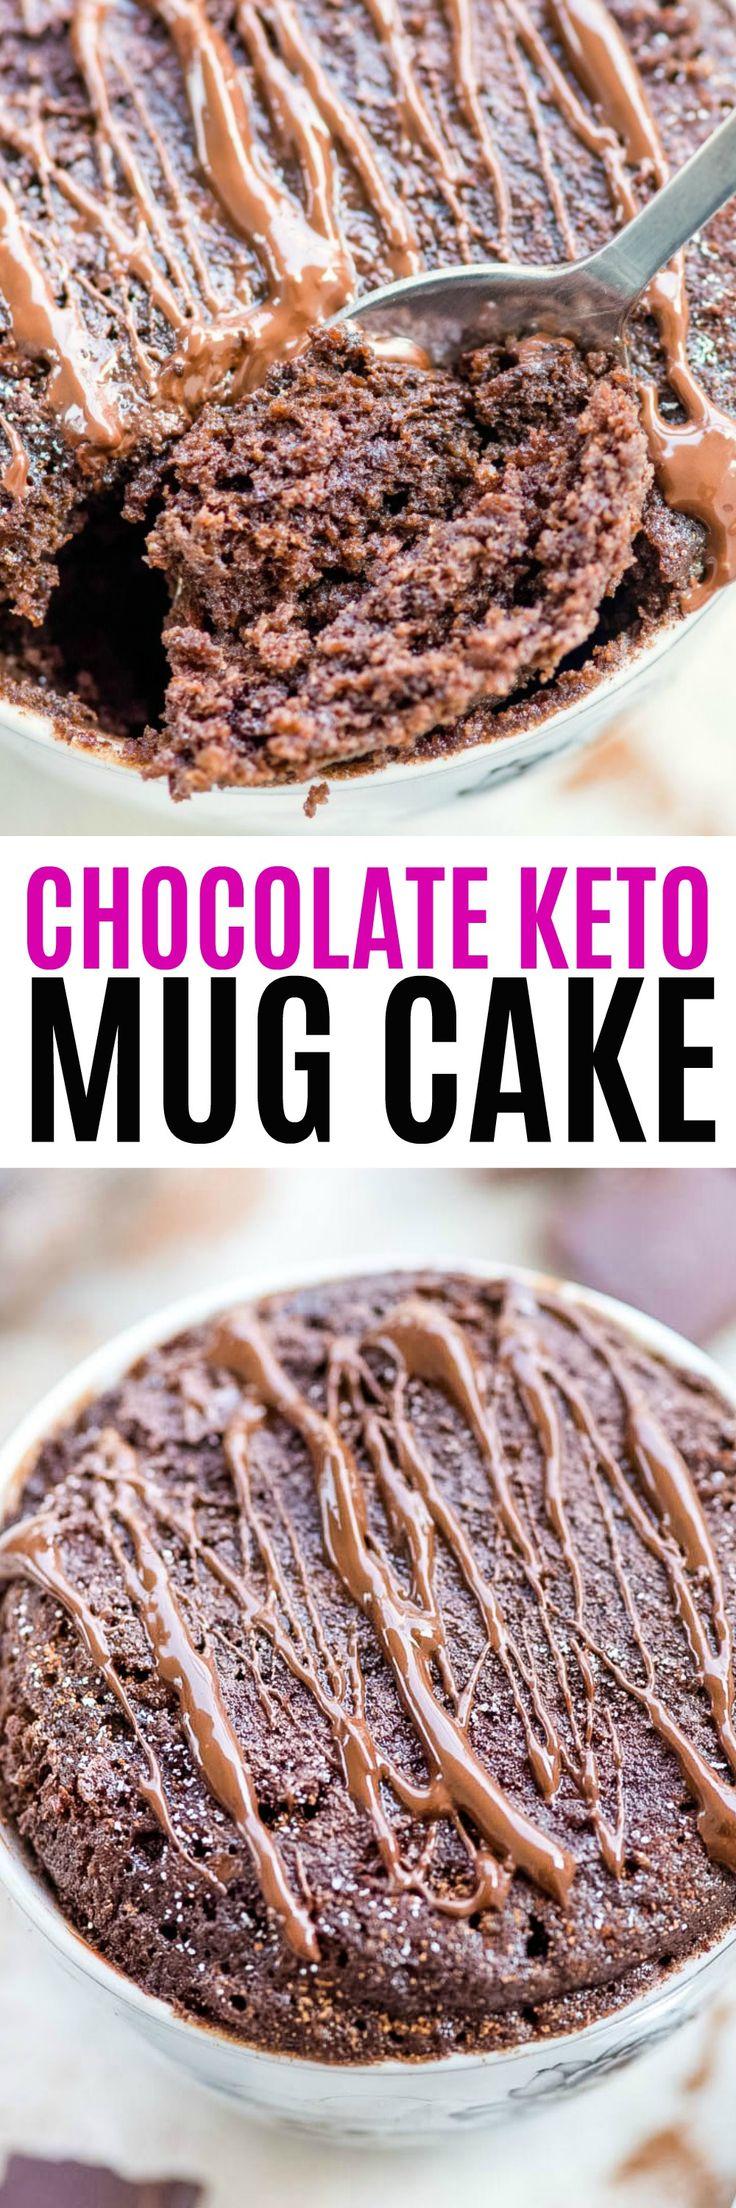 Chocolate Keto Mug Cake is perfectly moist and easy to ...